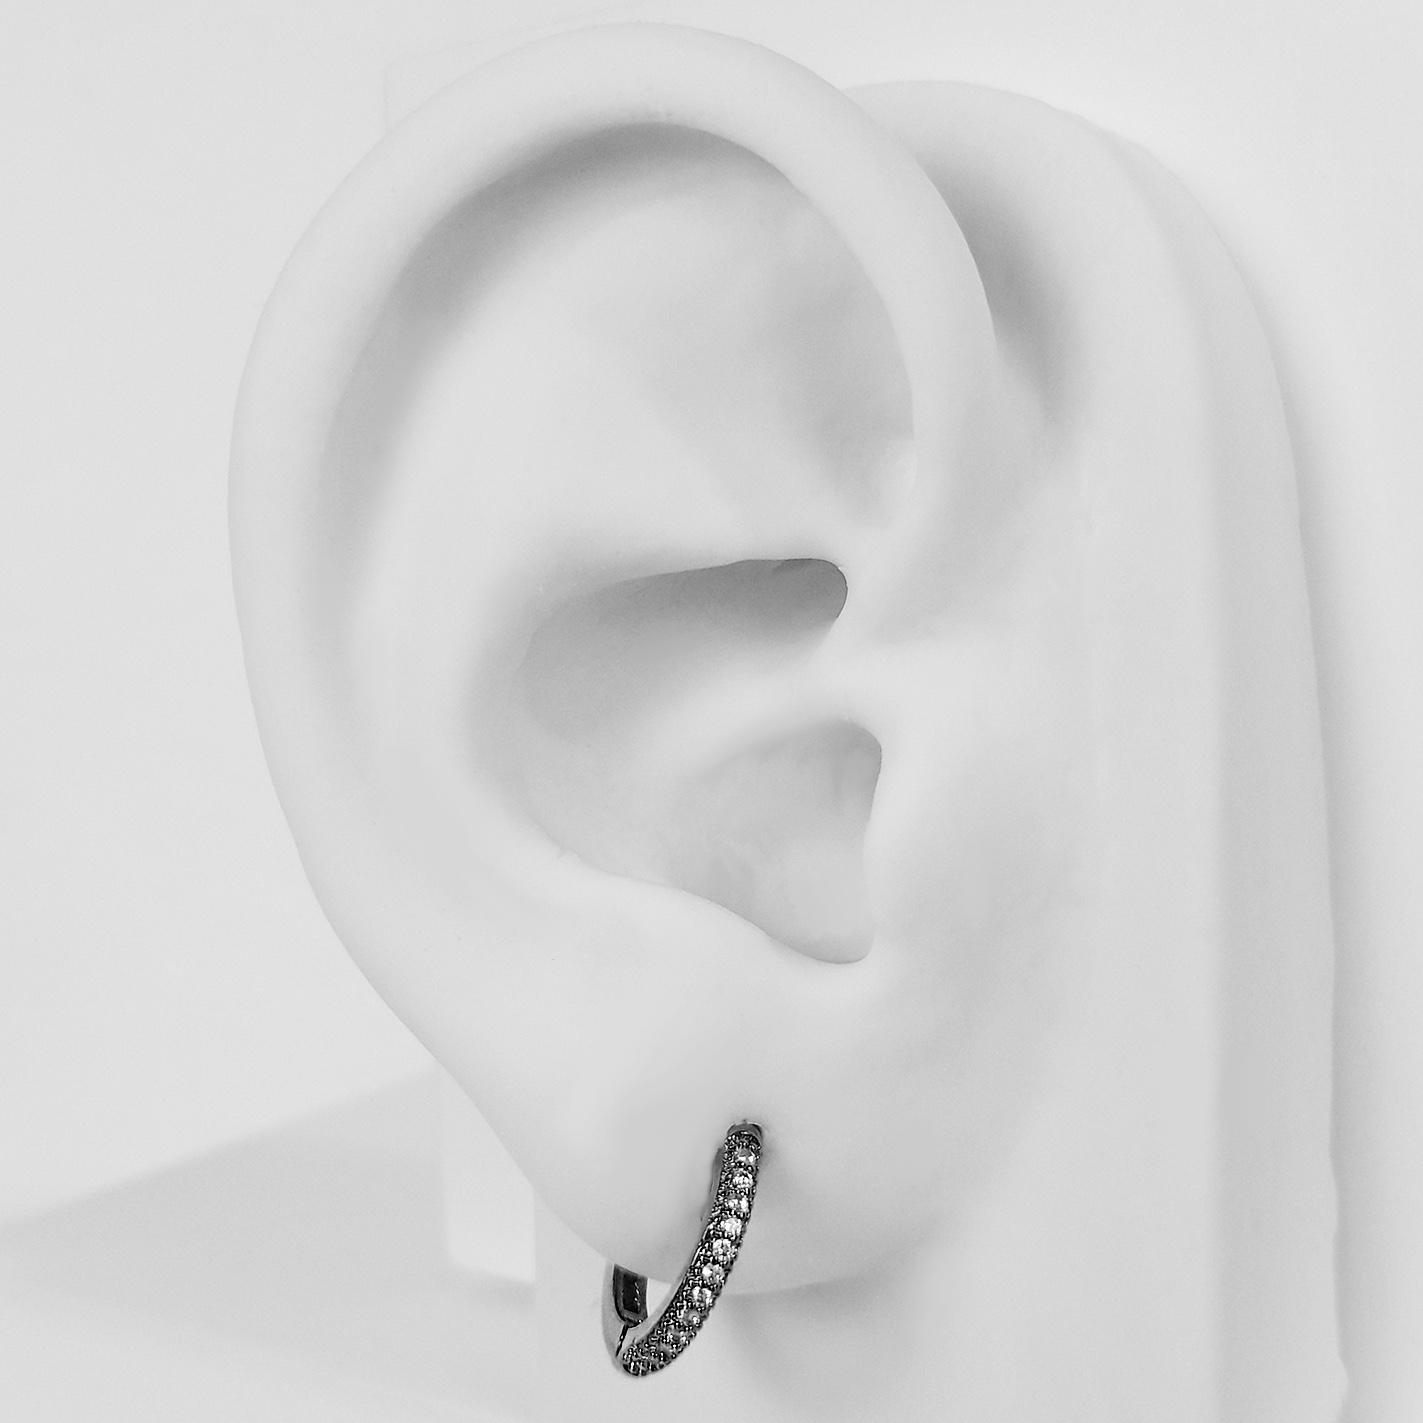 Brinco Argola Cravejada 1,4 cm Banho Ródio Negro  - Lunozê Joias